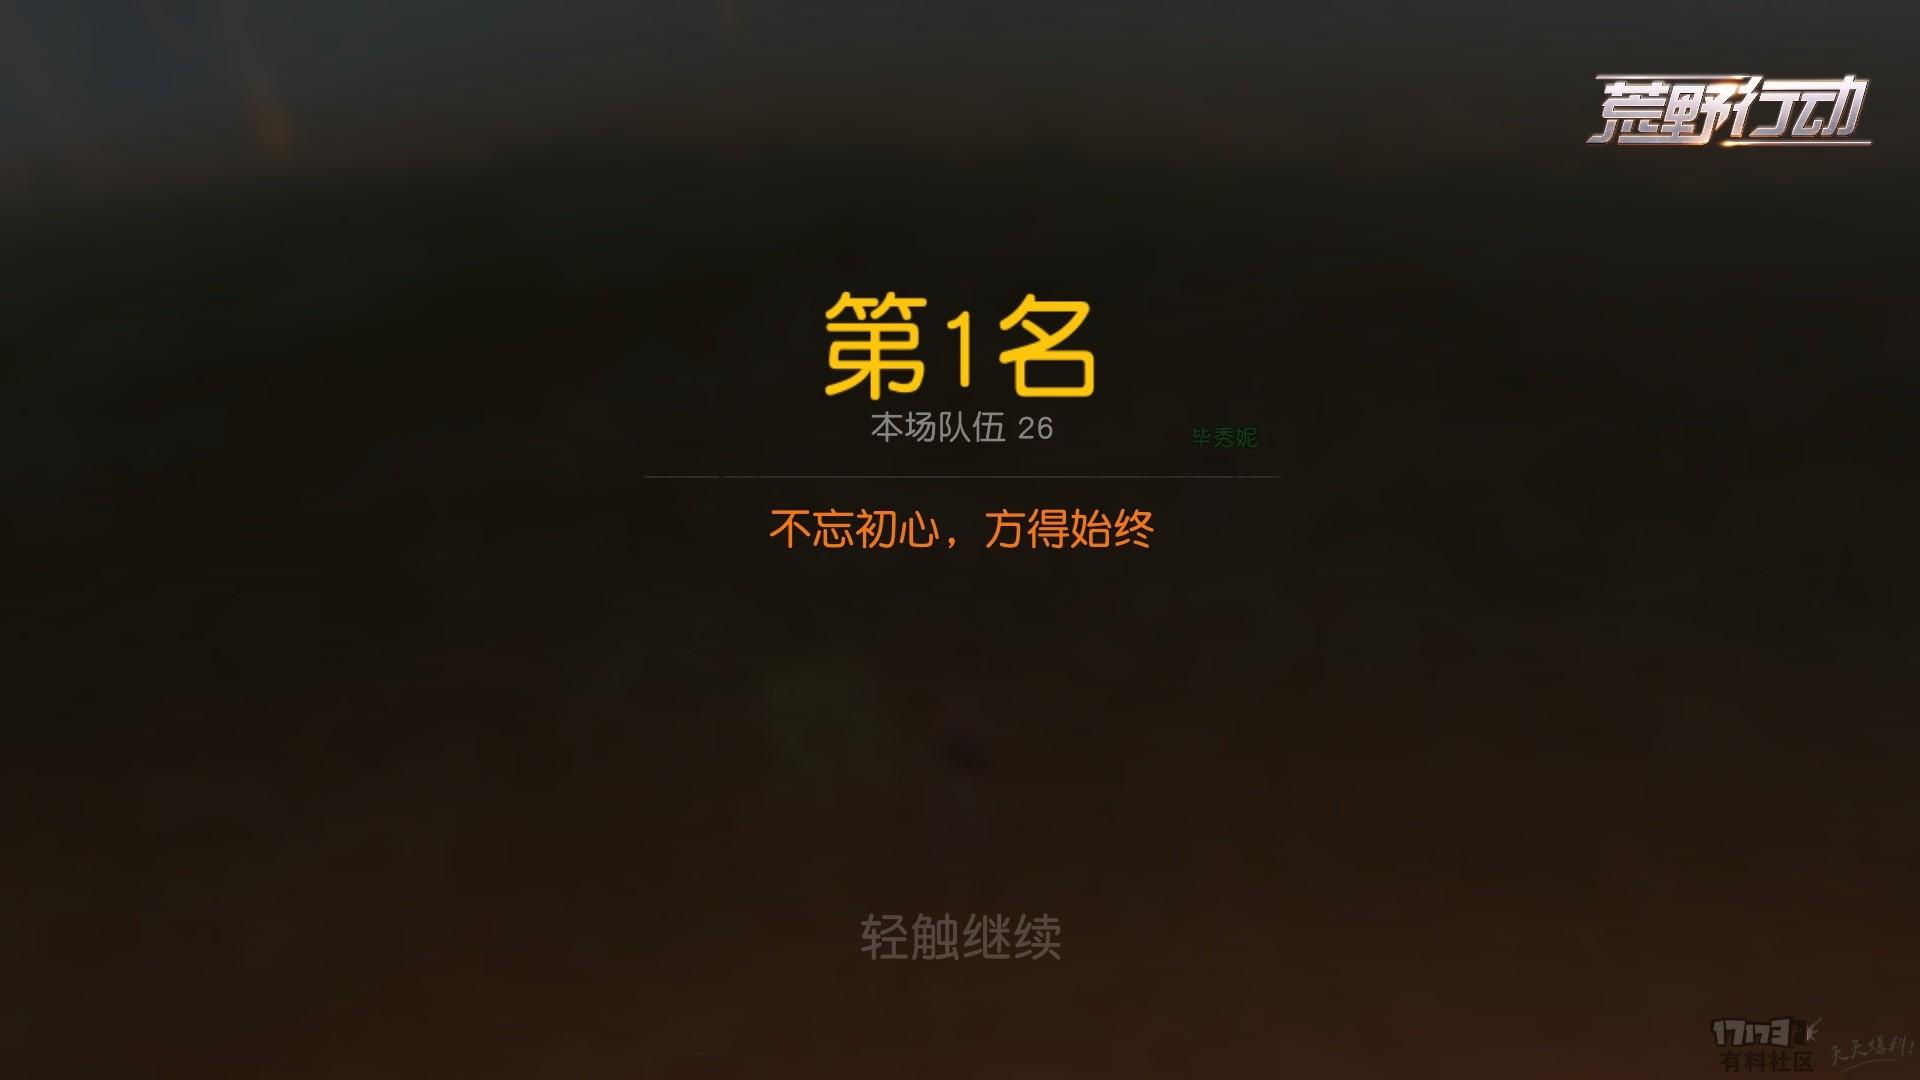 S71117-142732.jpg